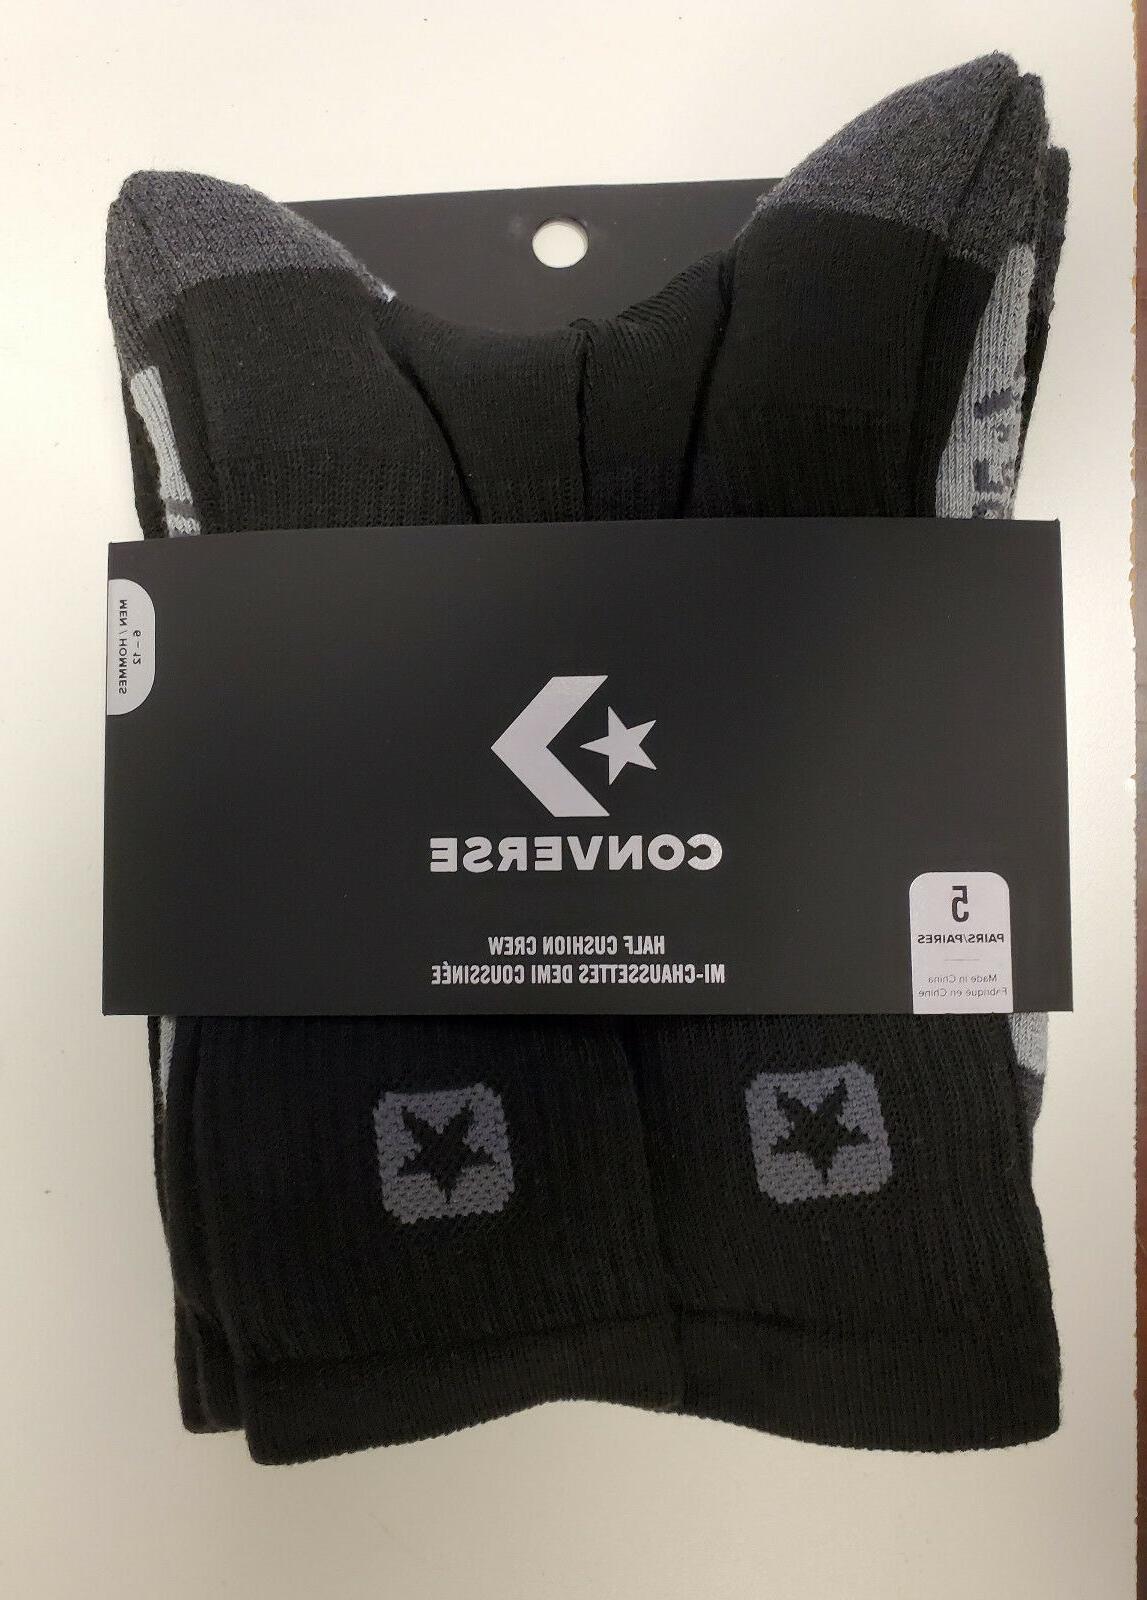 Converse Half Cushion Men's Crew Socks Black Gray 5 Pairs Pa